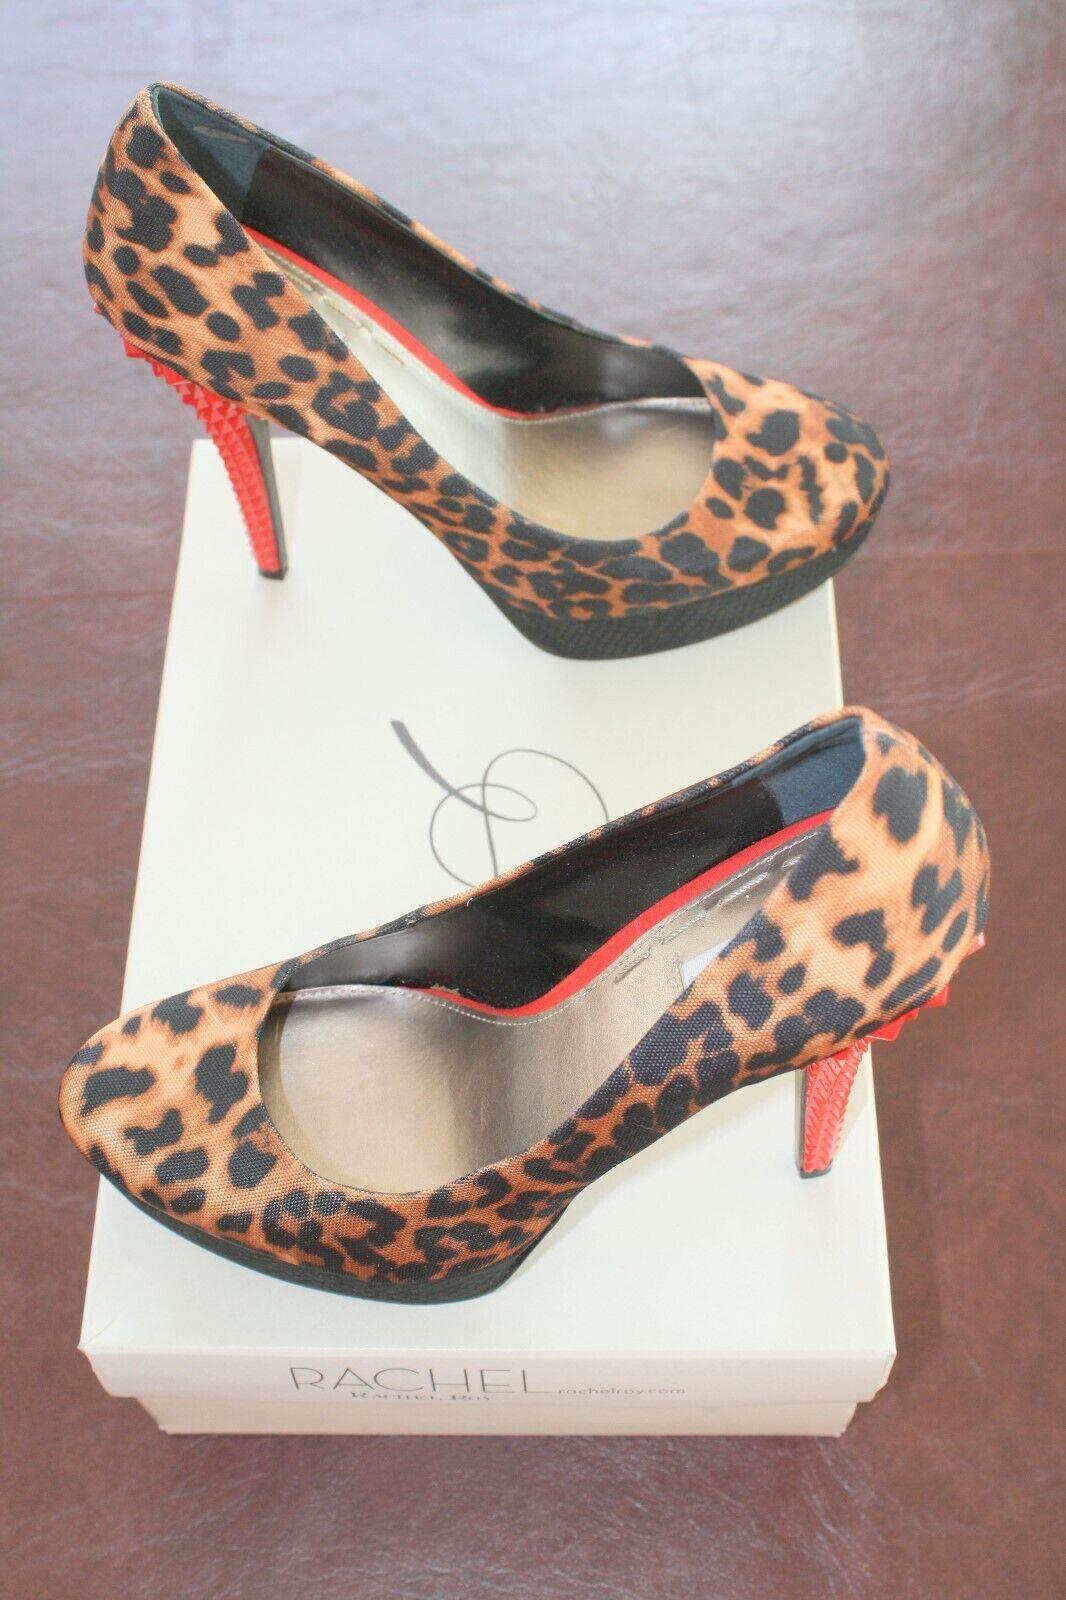 Rachel Animal Stampa rosso  Stiletto Heel Ladies scarpe di Rachel Roy 7.5 M  Sconto del 70%